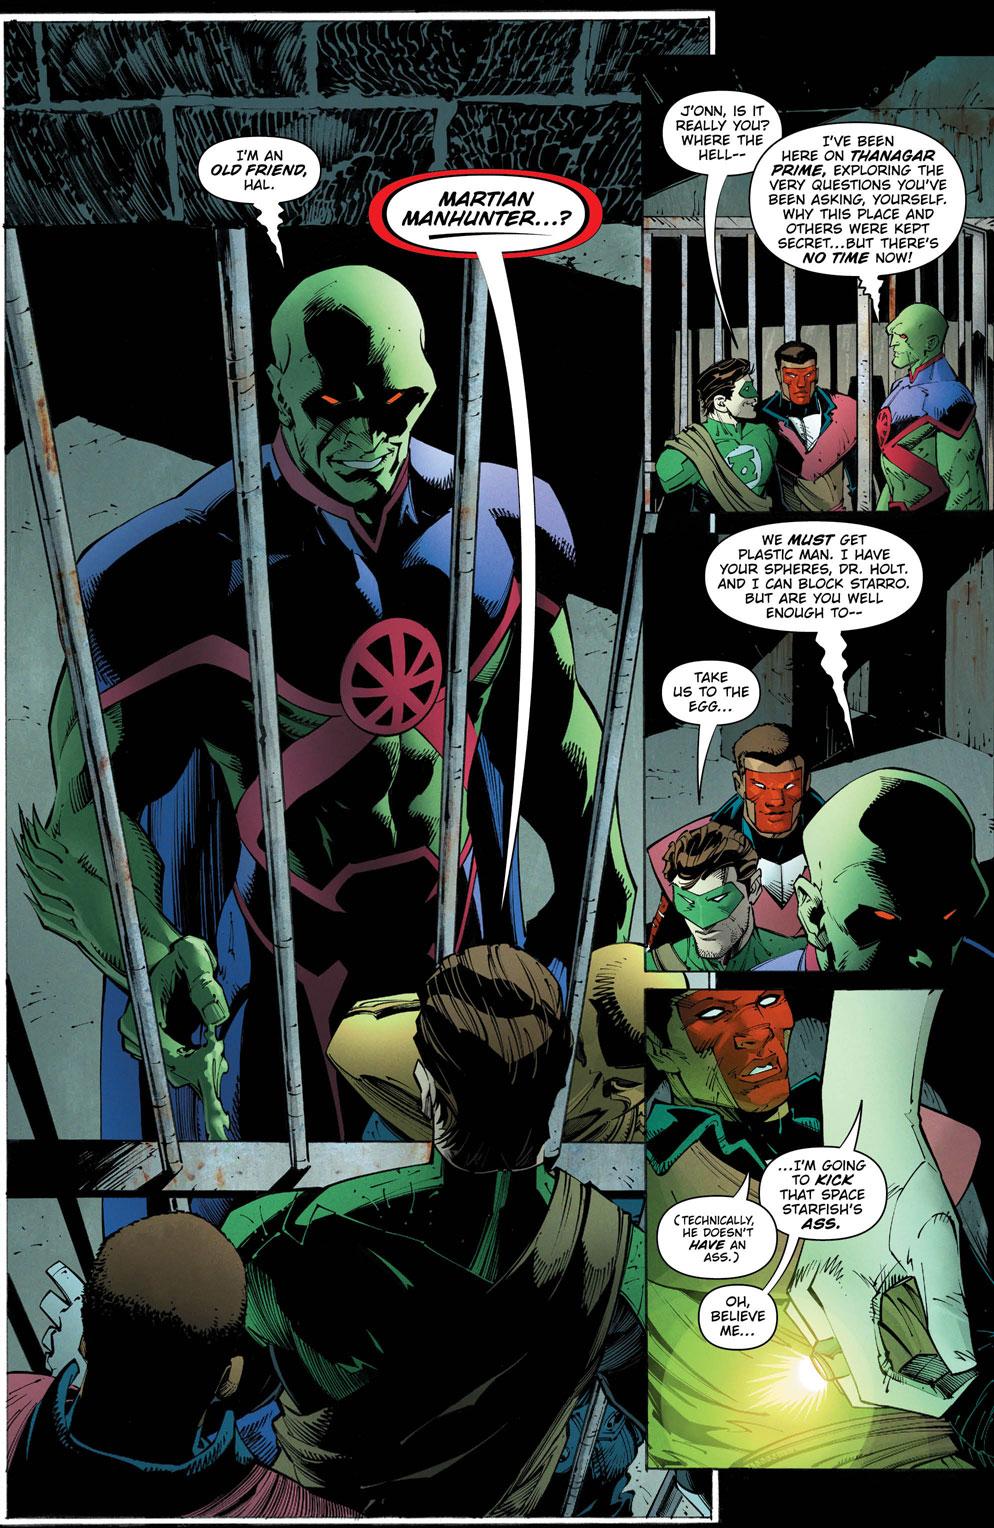 Dark Nights Metal 5_6 - DC Comics News